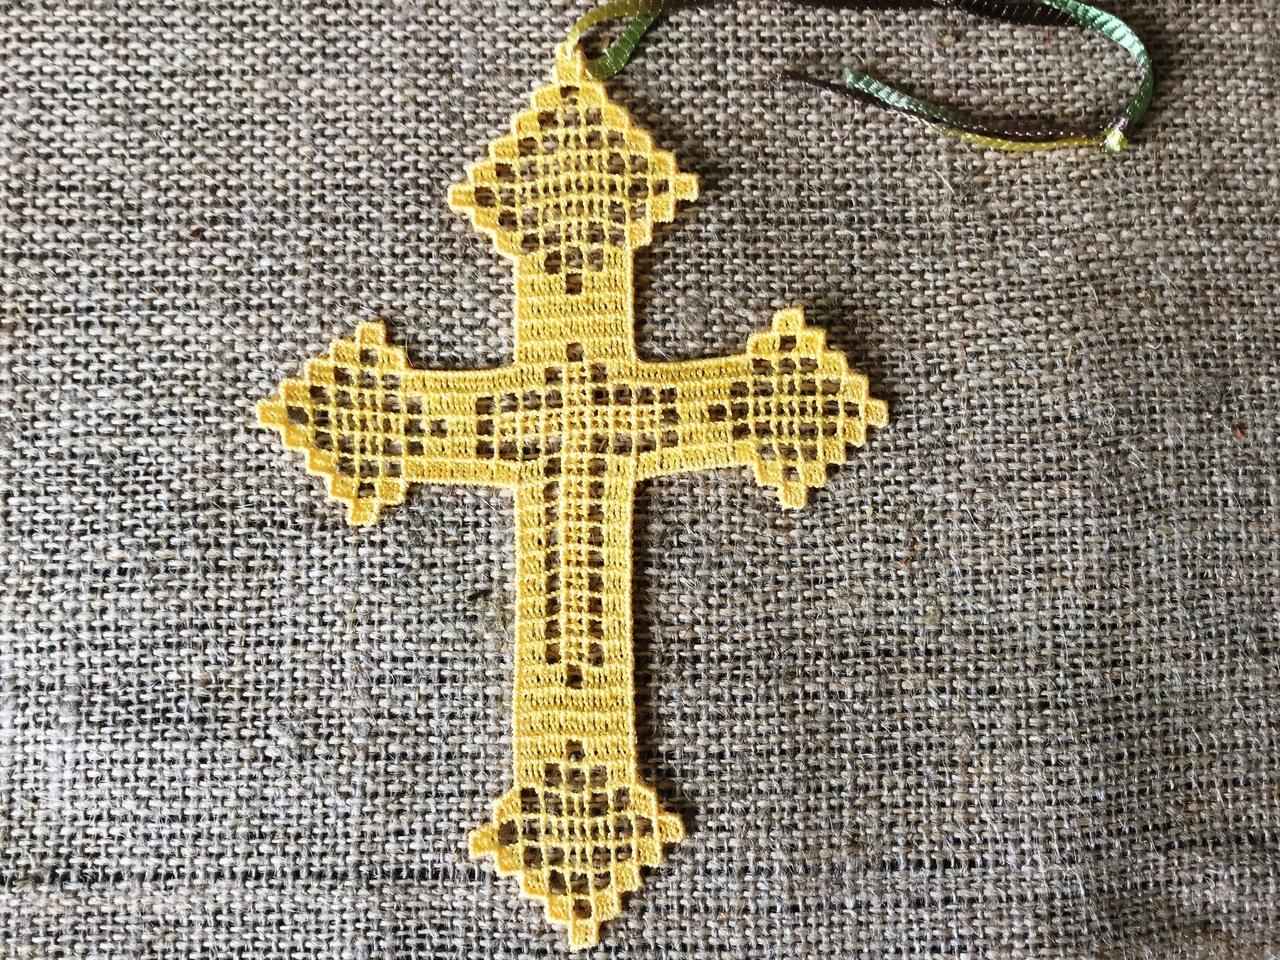 Fsl Cross Bookmark Machine Embroidery Design Machine Embroidery Designs Lace Art